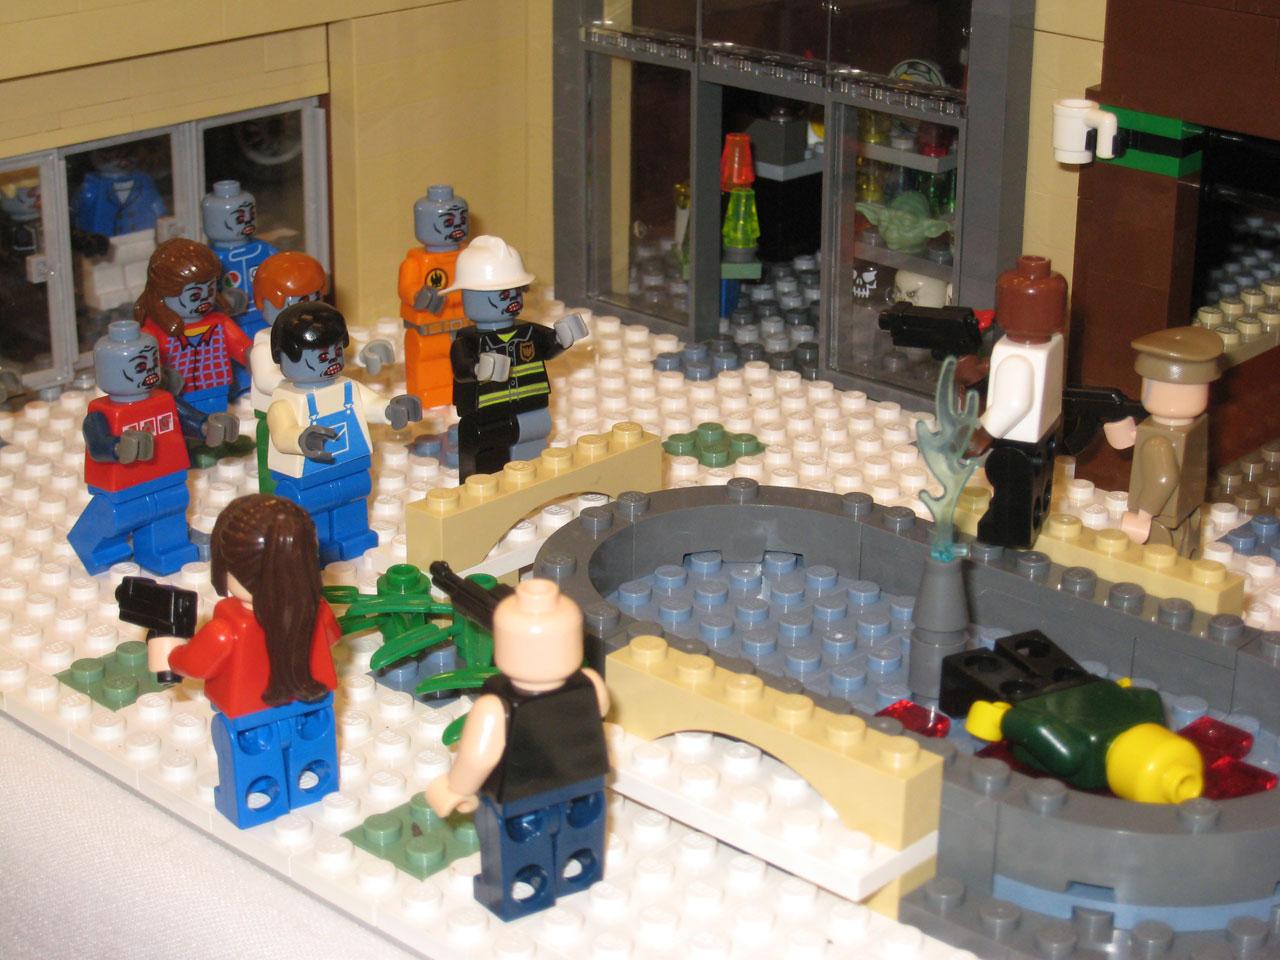 https://www.l4d.com/blog/images/posts/002/Lego04.jpg